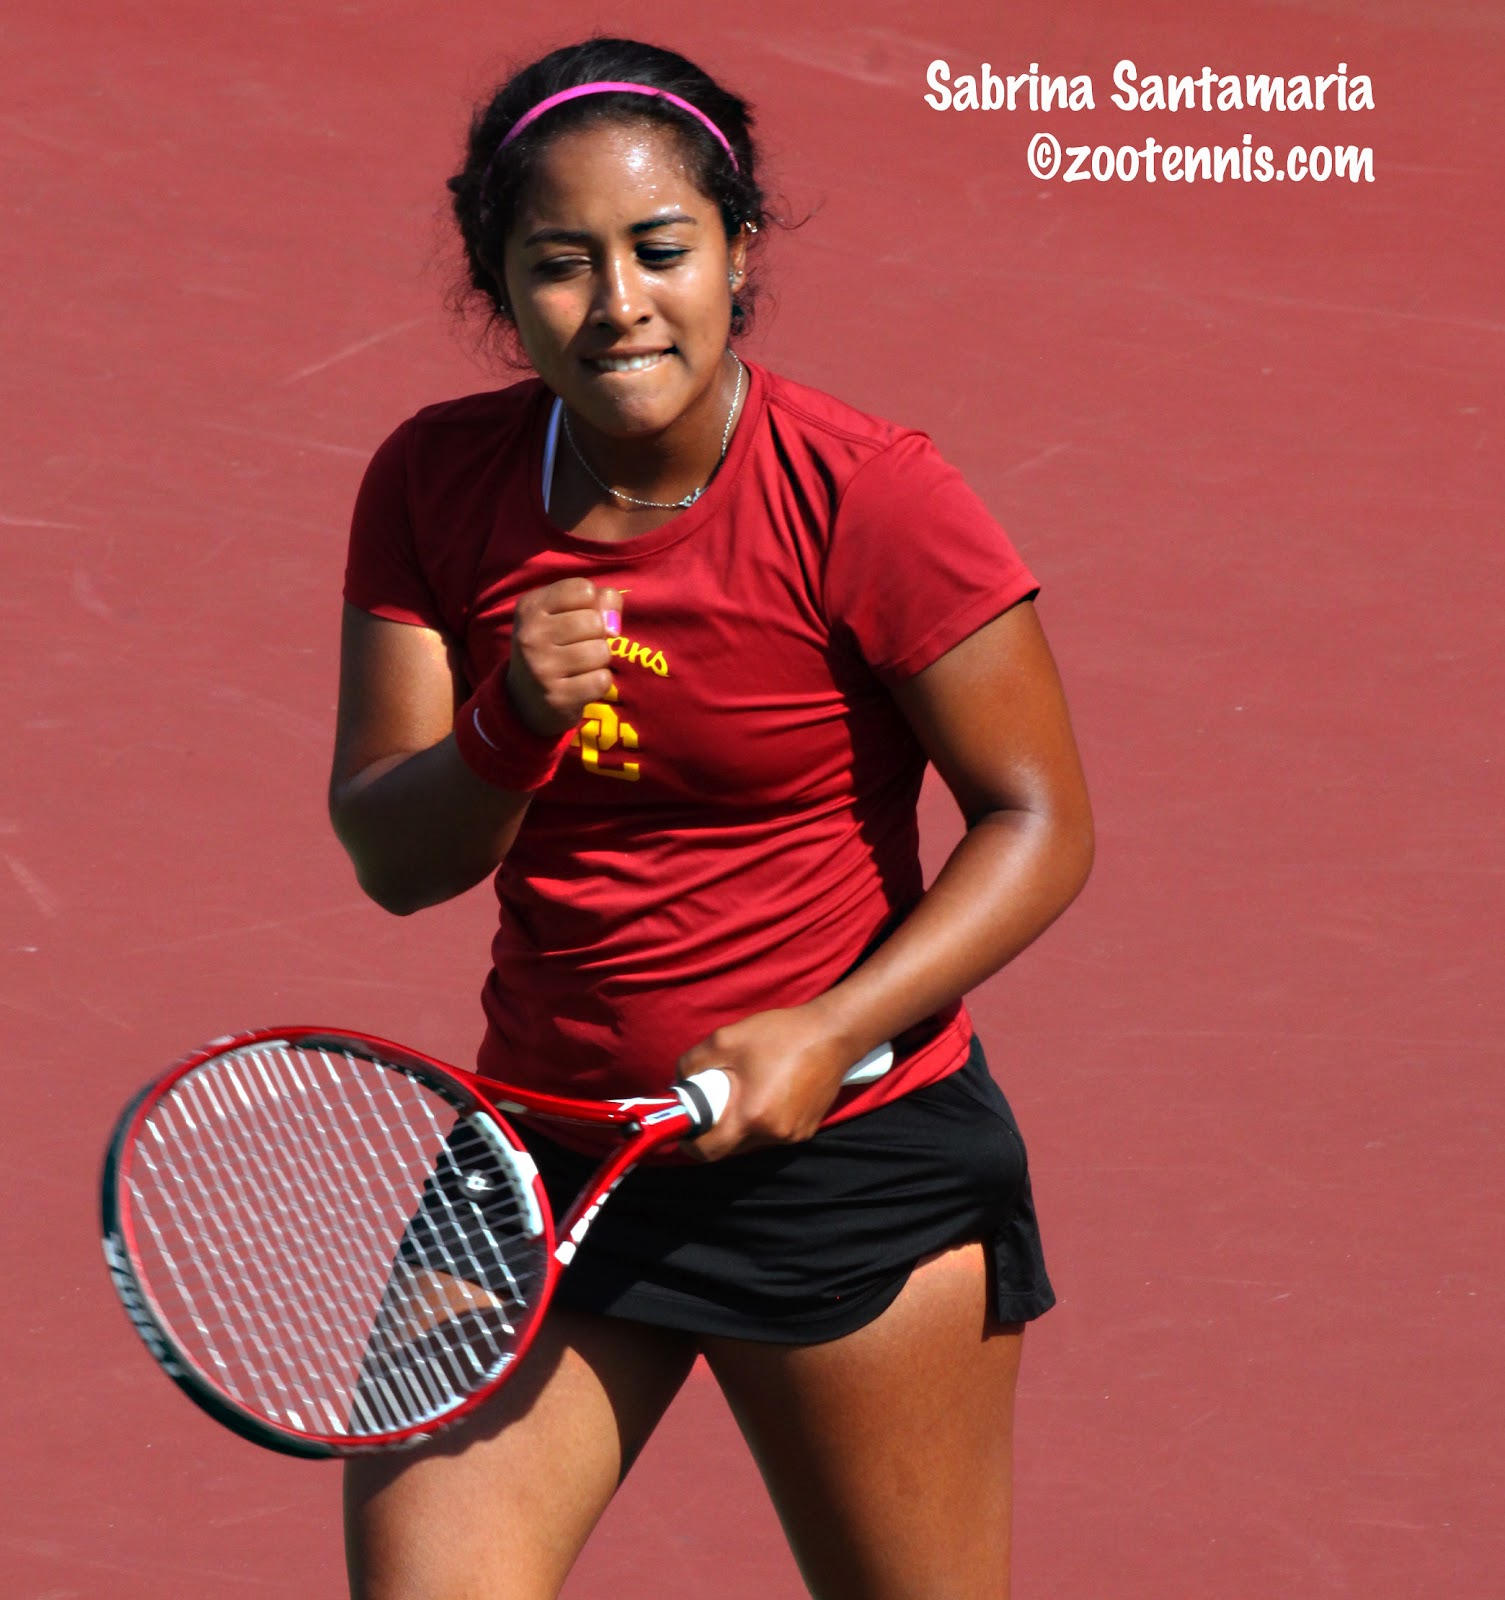 Sabrina Santamaria